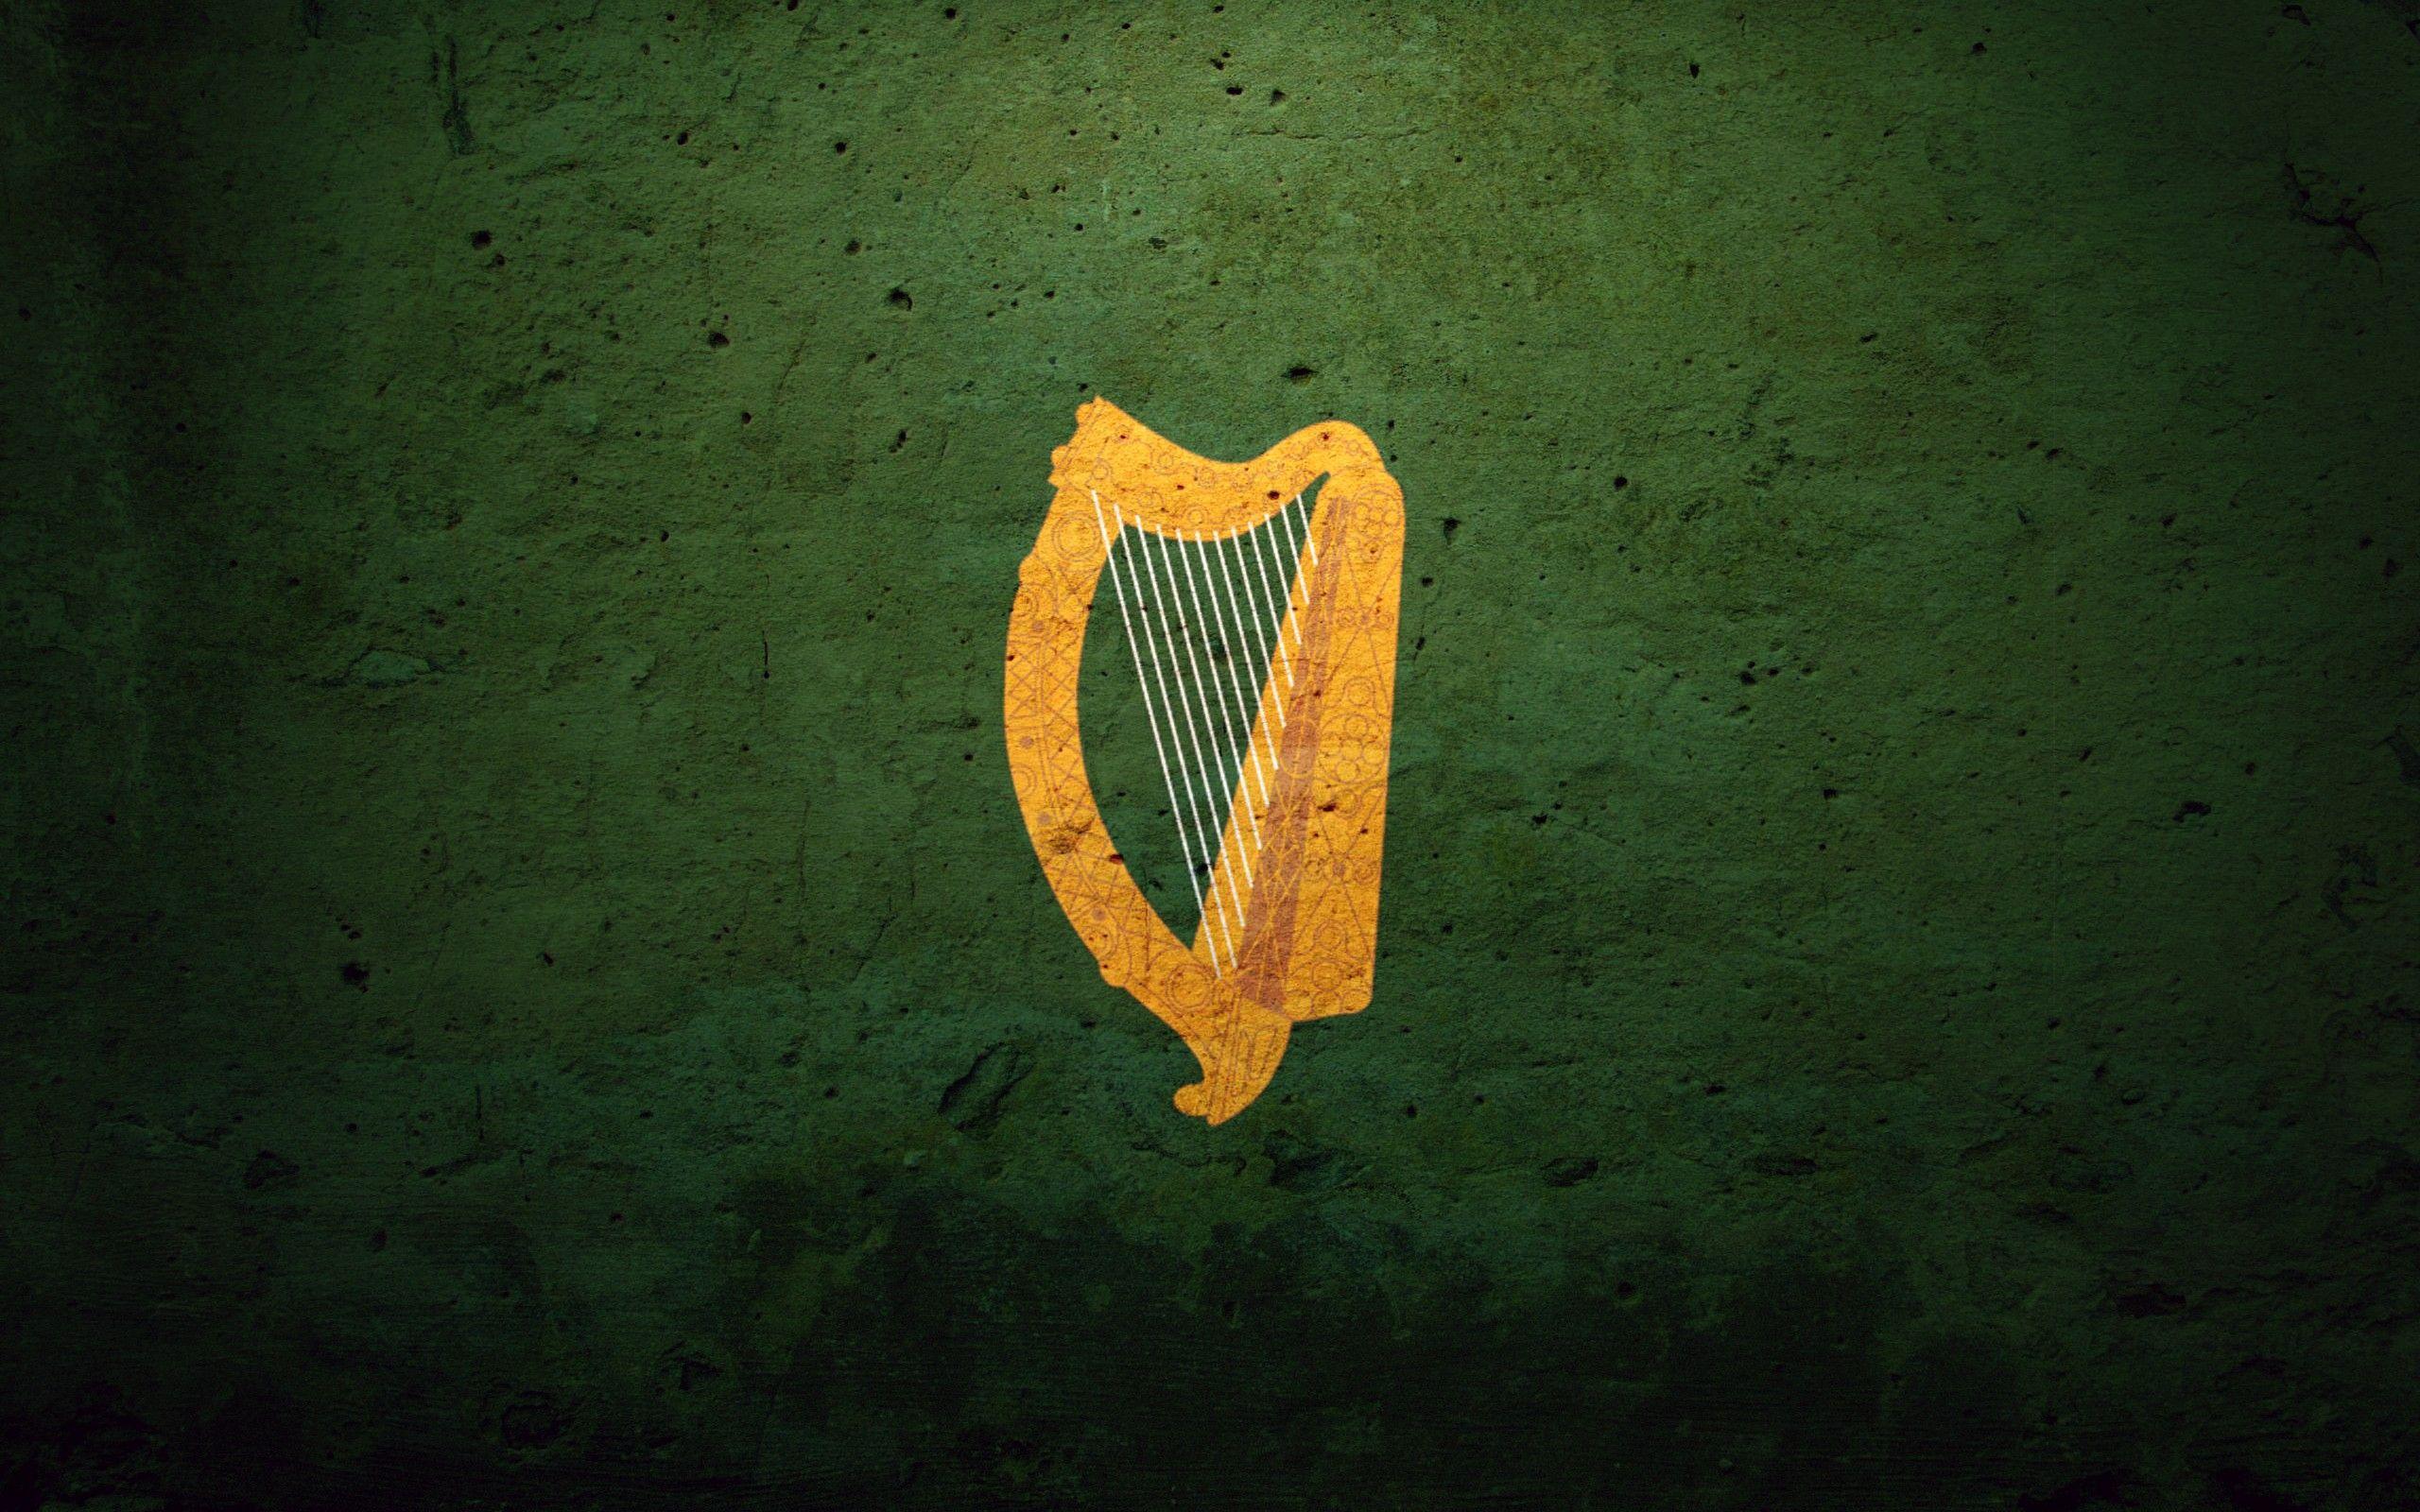 Ireland flags Coat of arms harp irish harp 2560x1600 Wallpaper 2560x1600